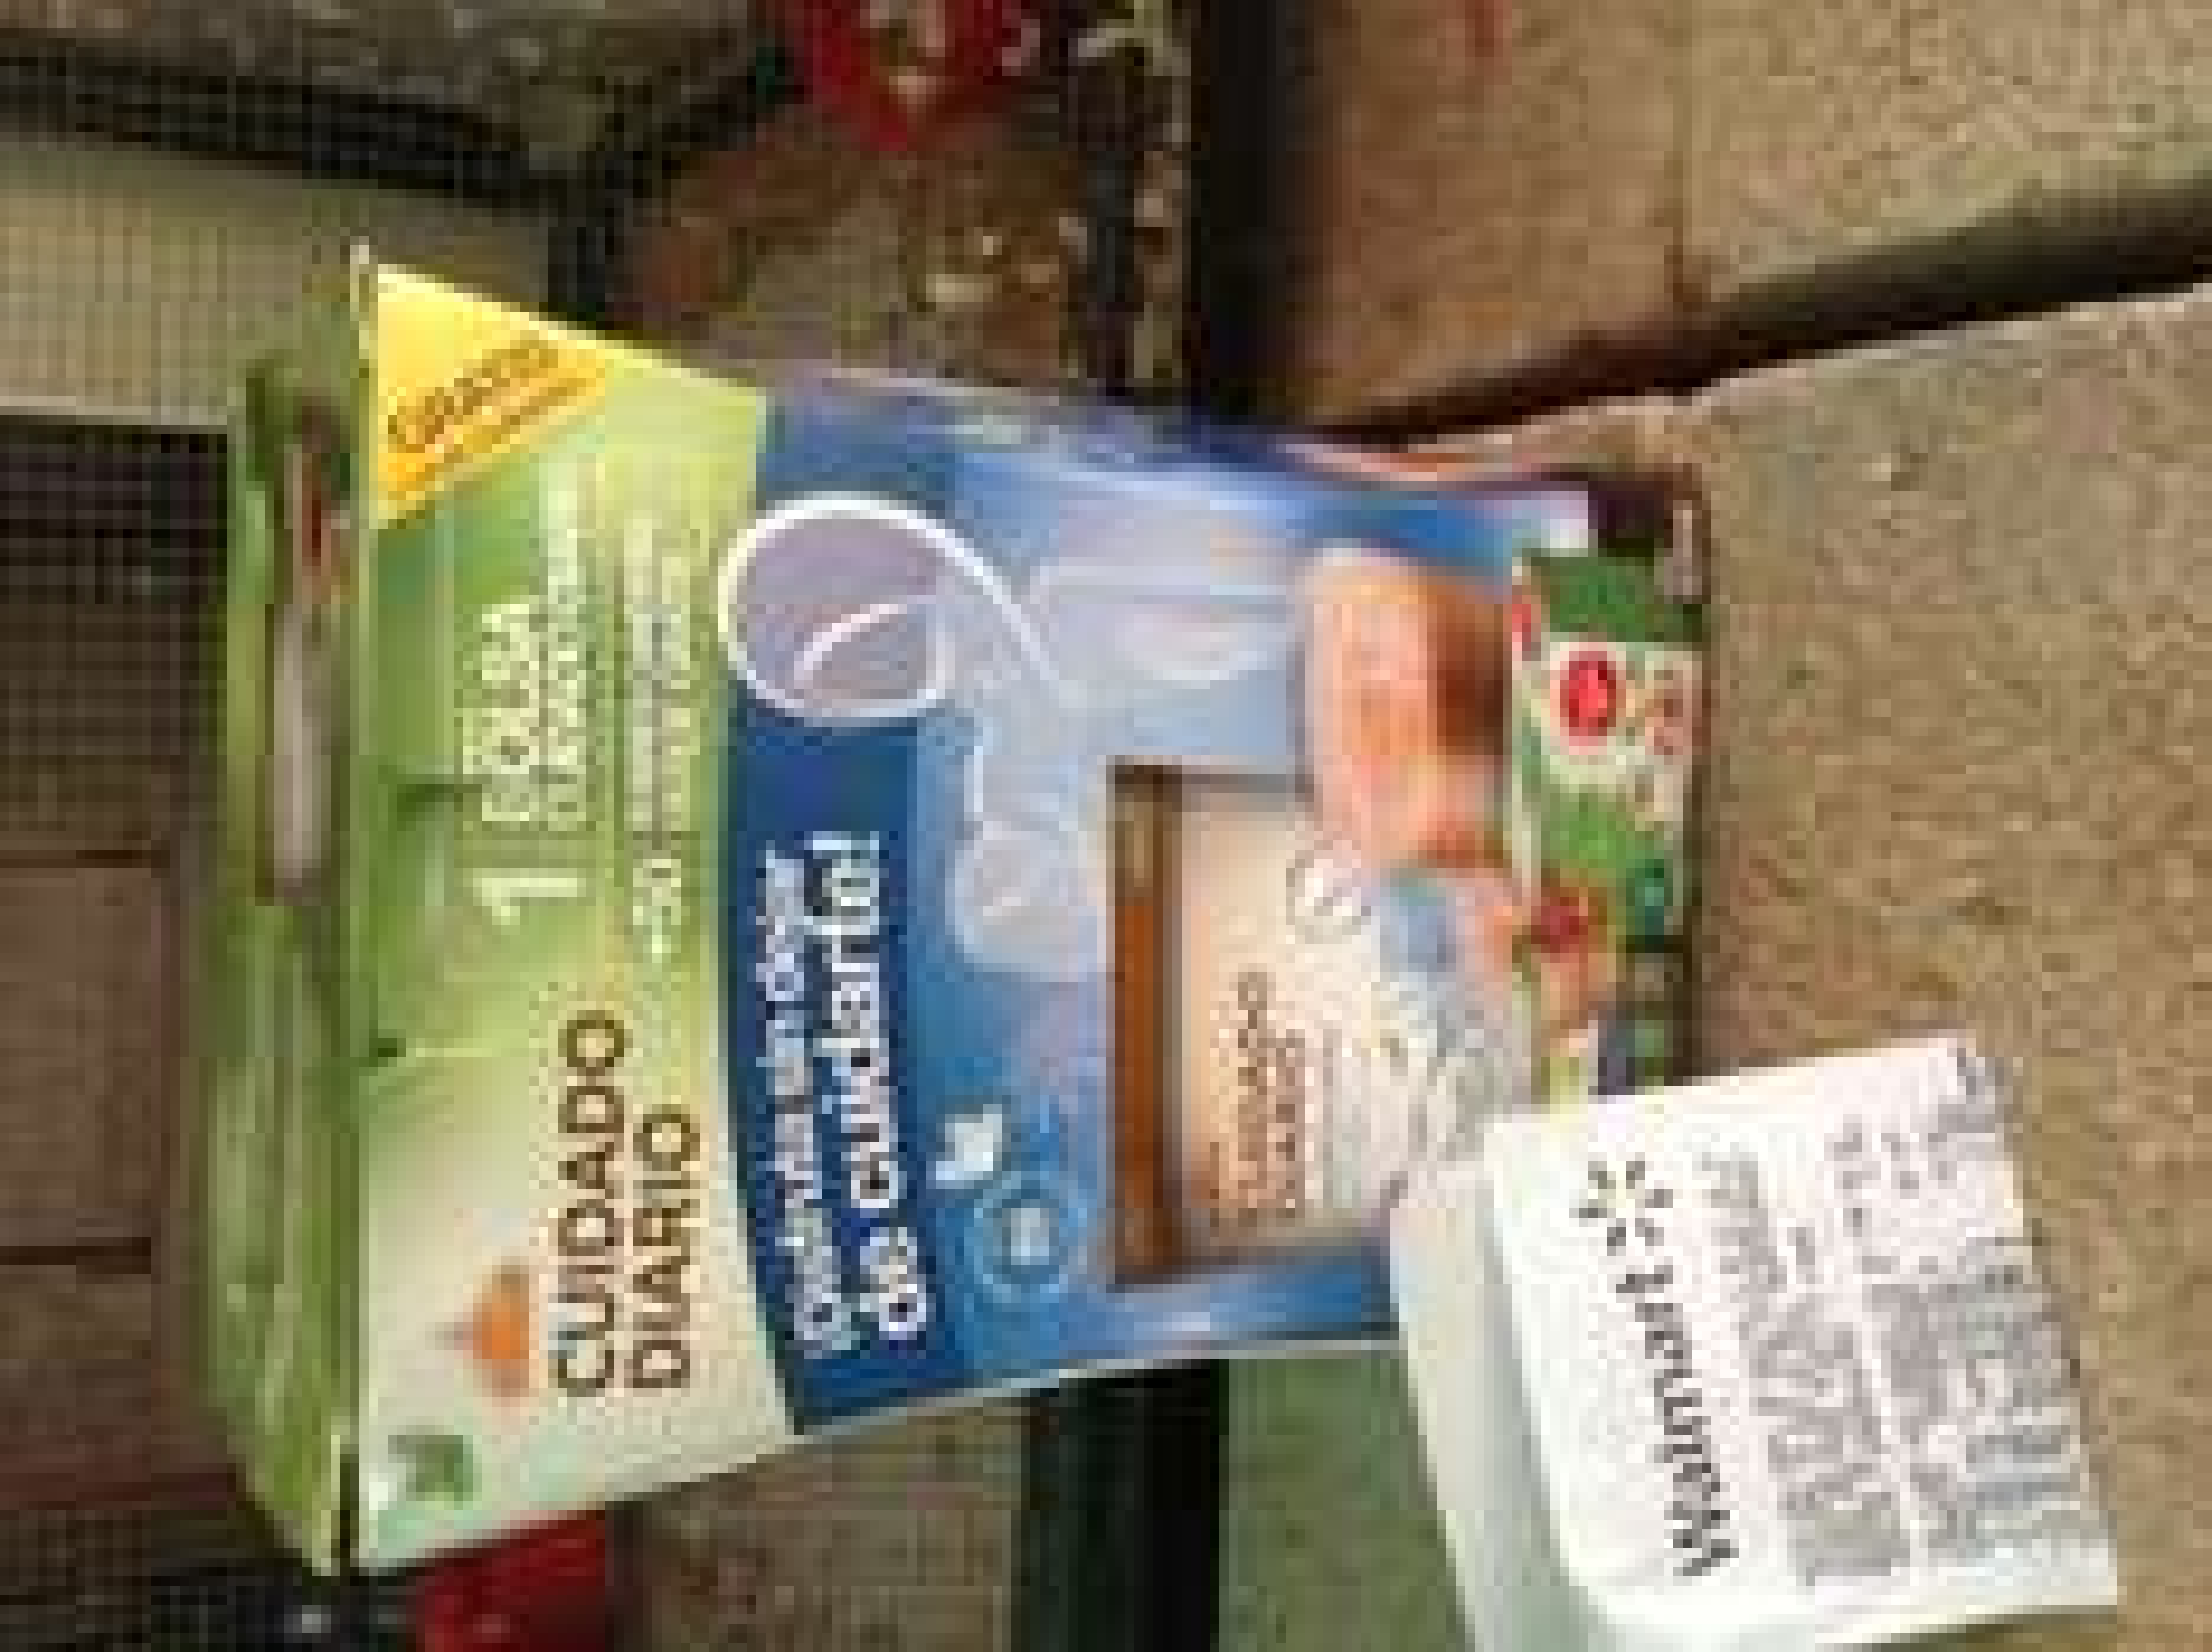 Walmart Nichupté Cancún: bolsa de Cuidado Diario + 50 sobres de Canderel a $19.50